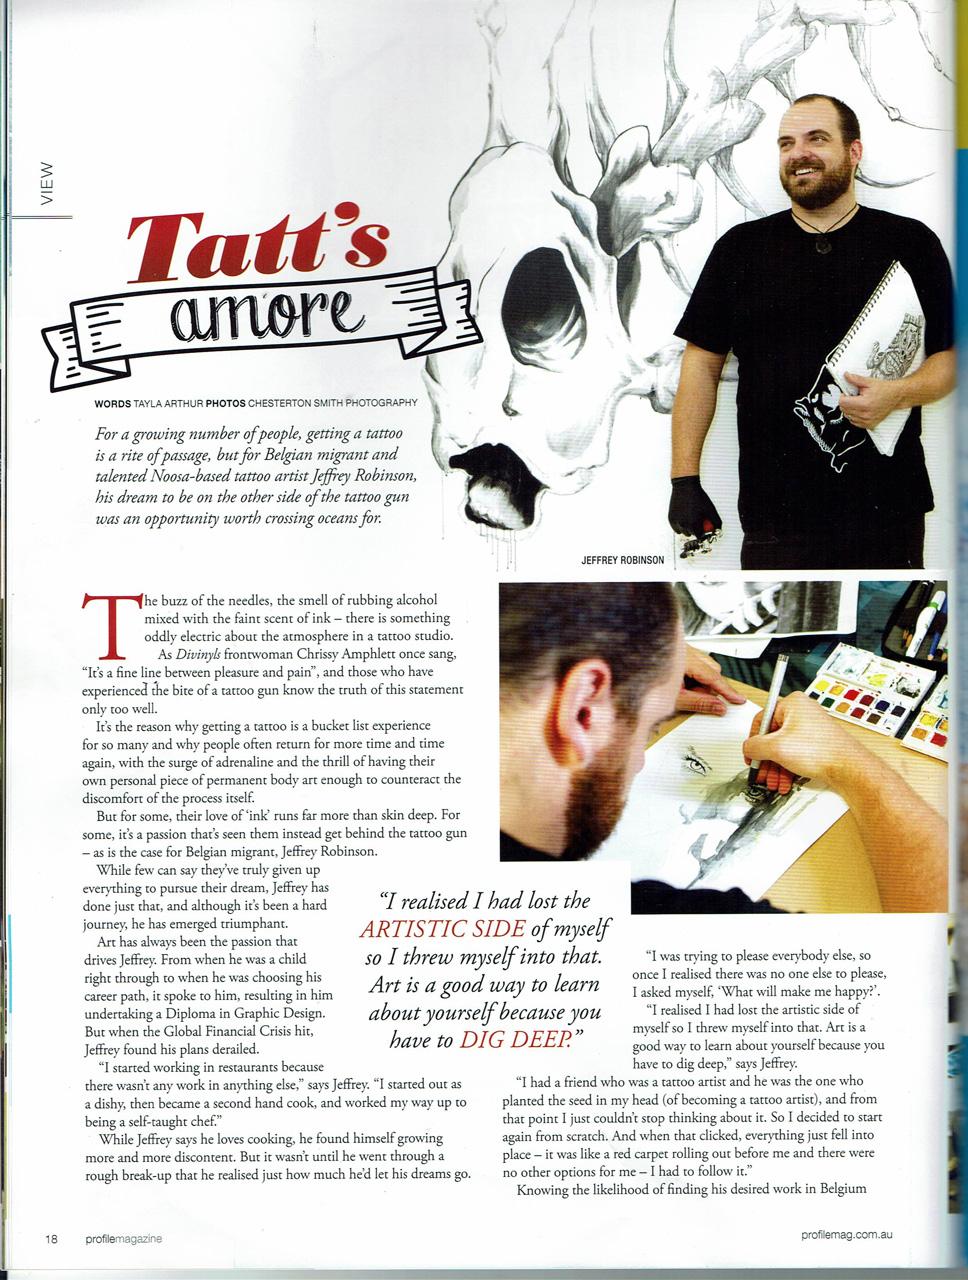 BigFish tattoo in the Bucket List edition of Prfile Magazine